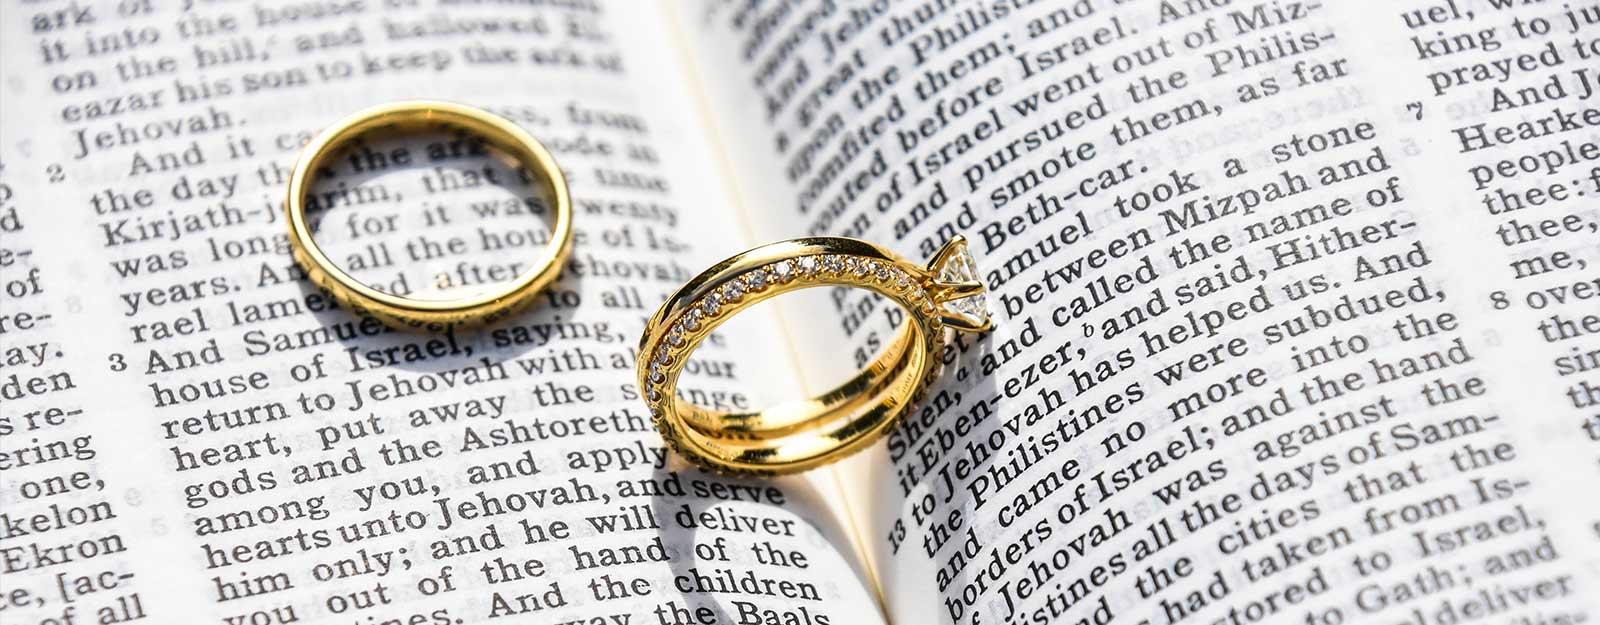 full assistance paperwork weddings como